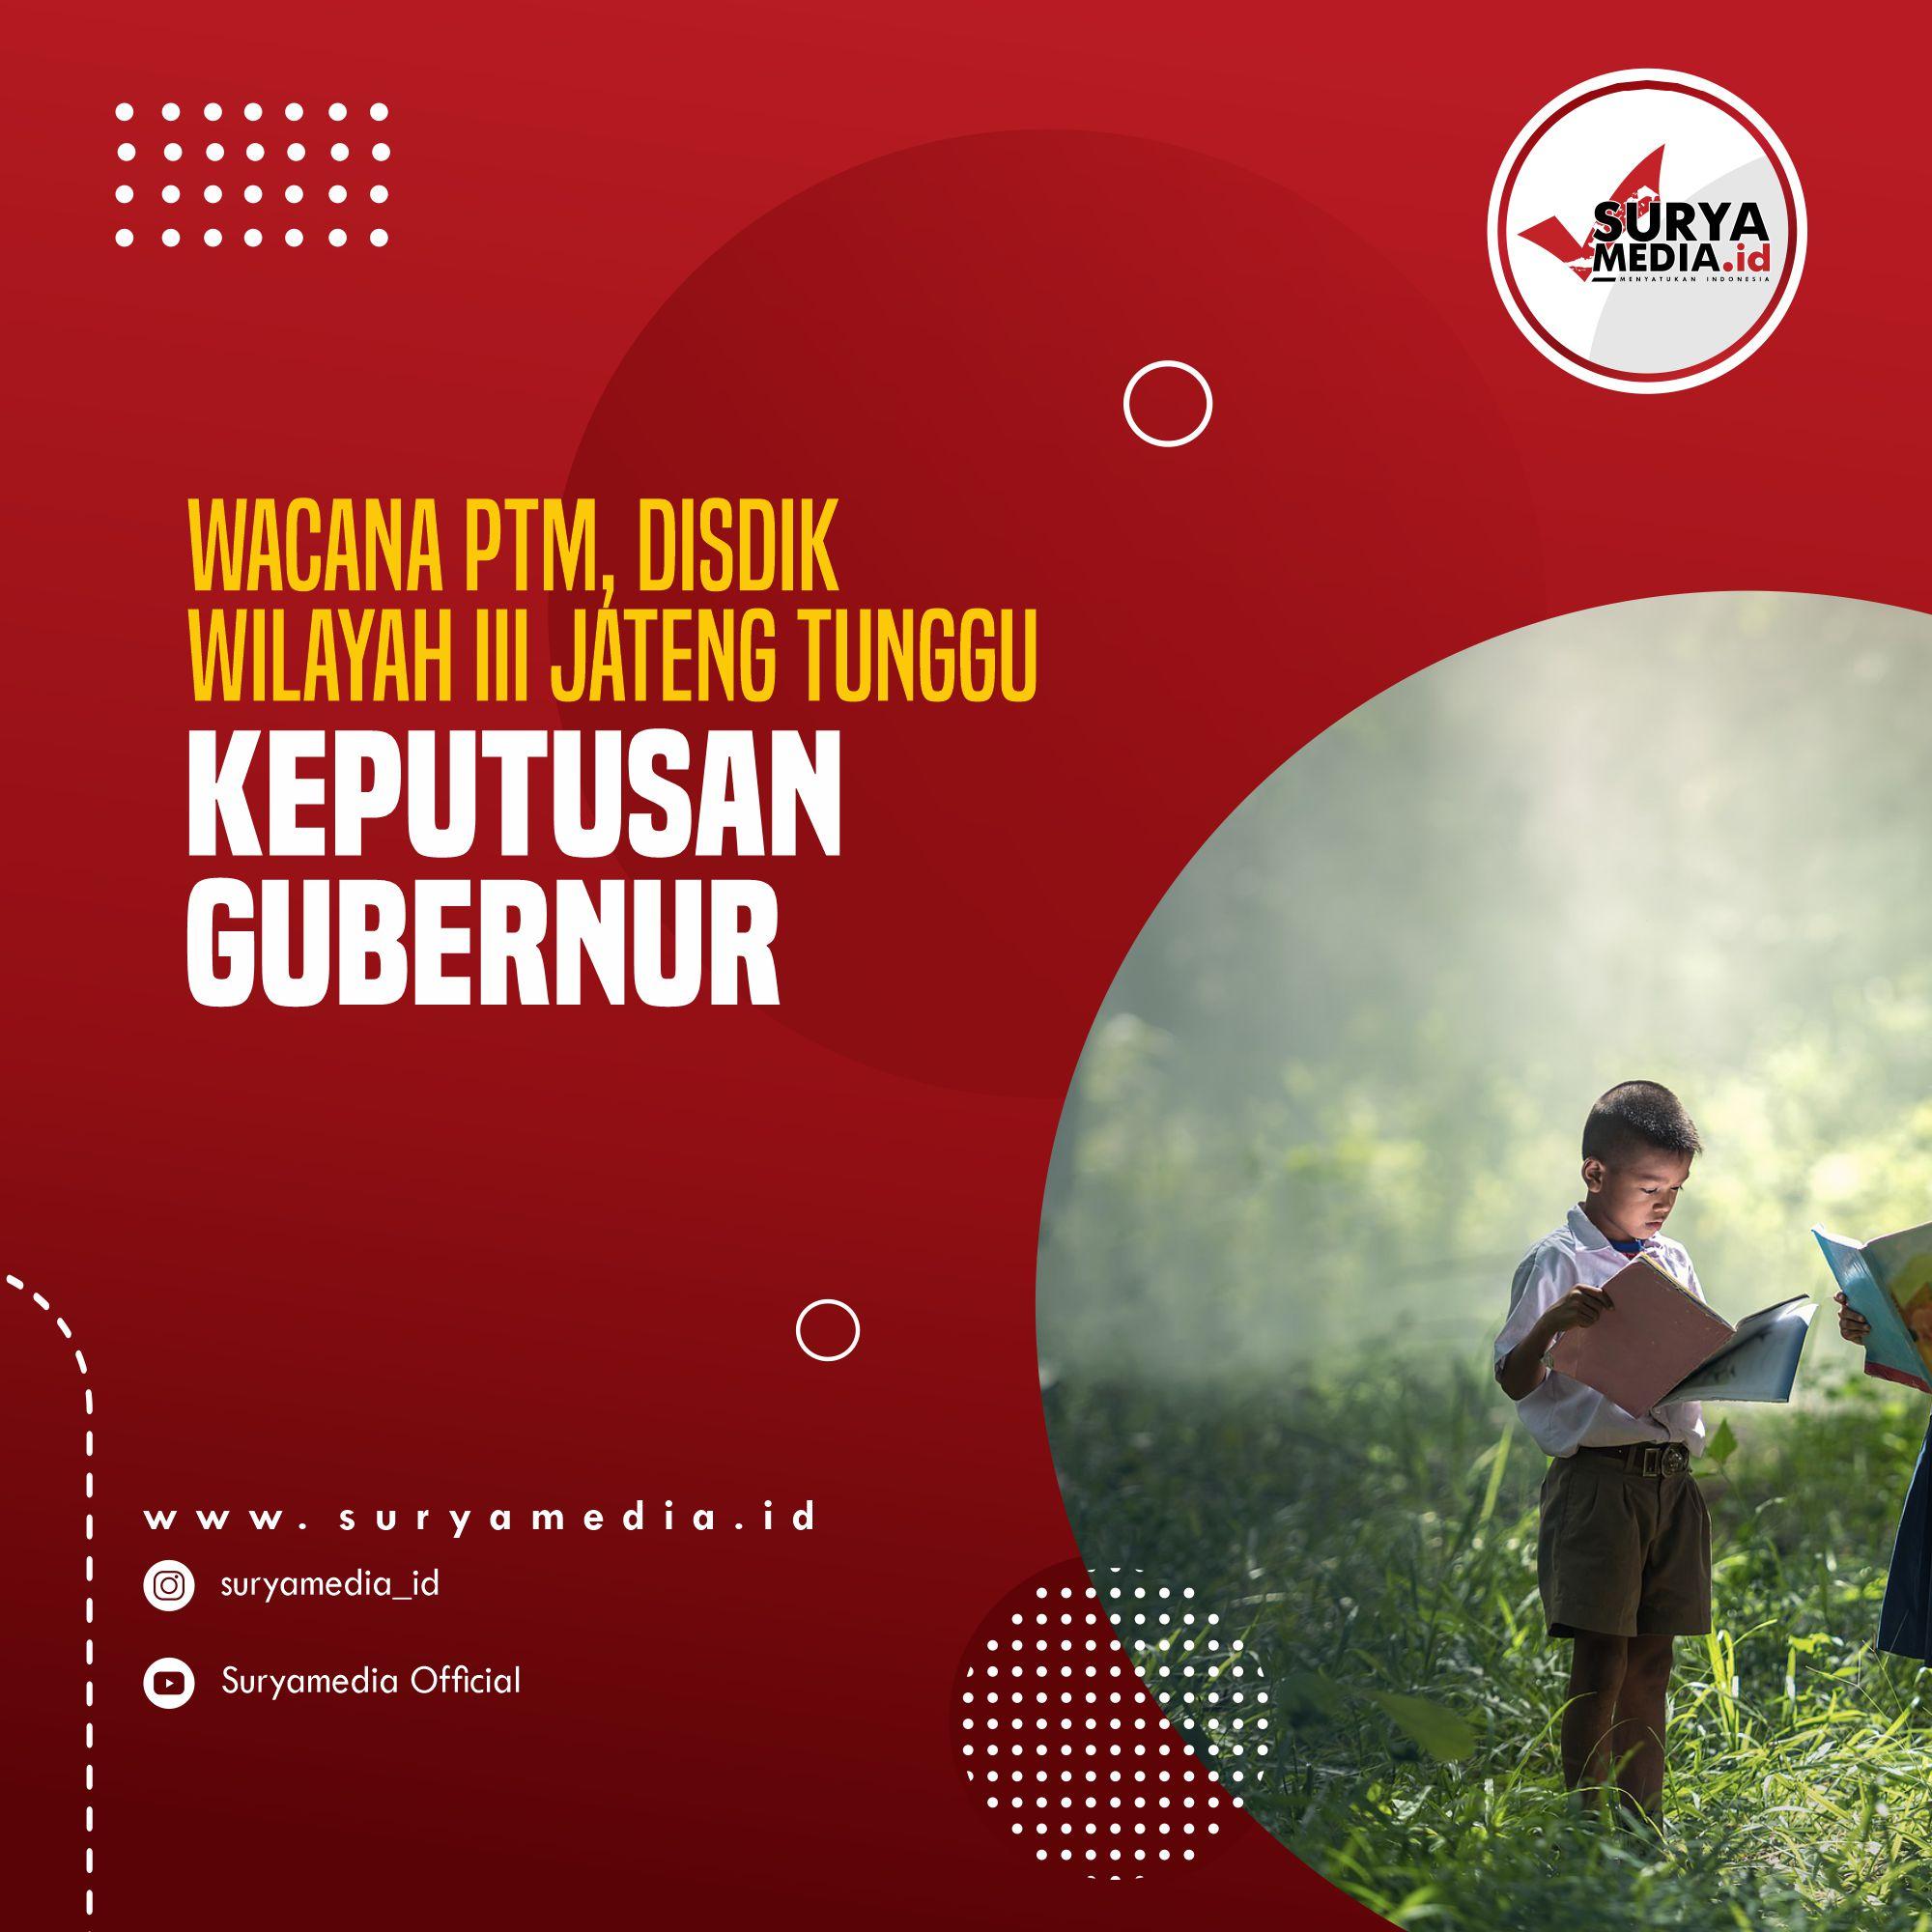 Wacana PTM, Disdik Wilayah III Jateng Tunggu Keputusan Gubernur A